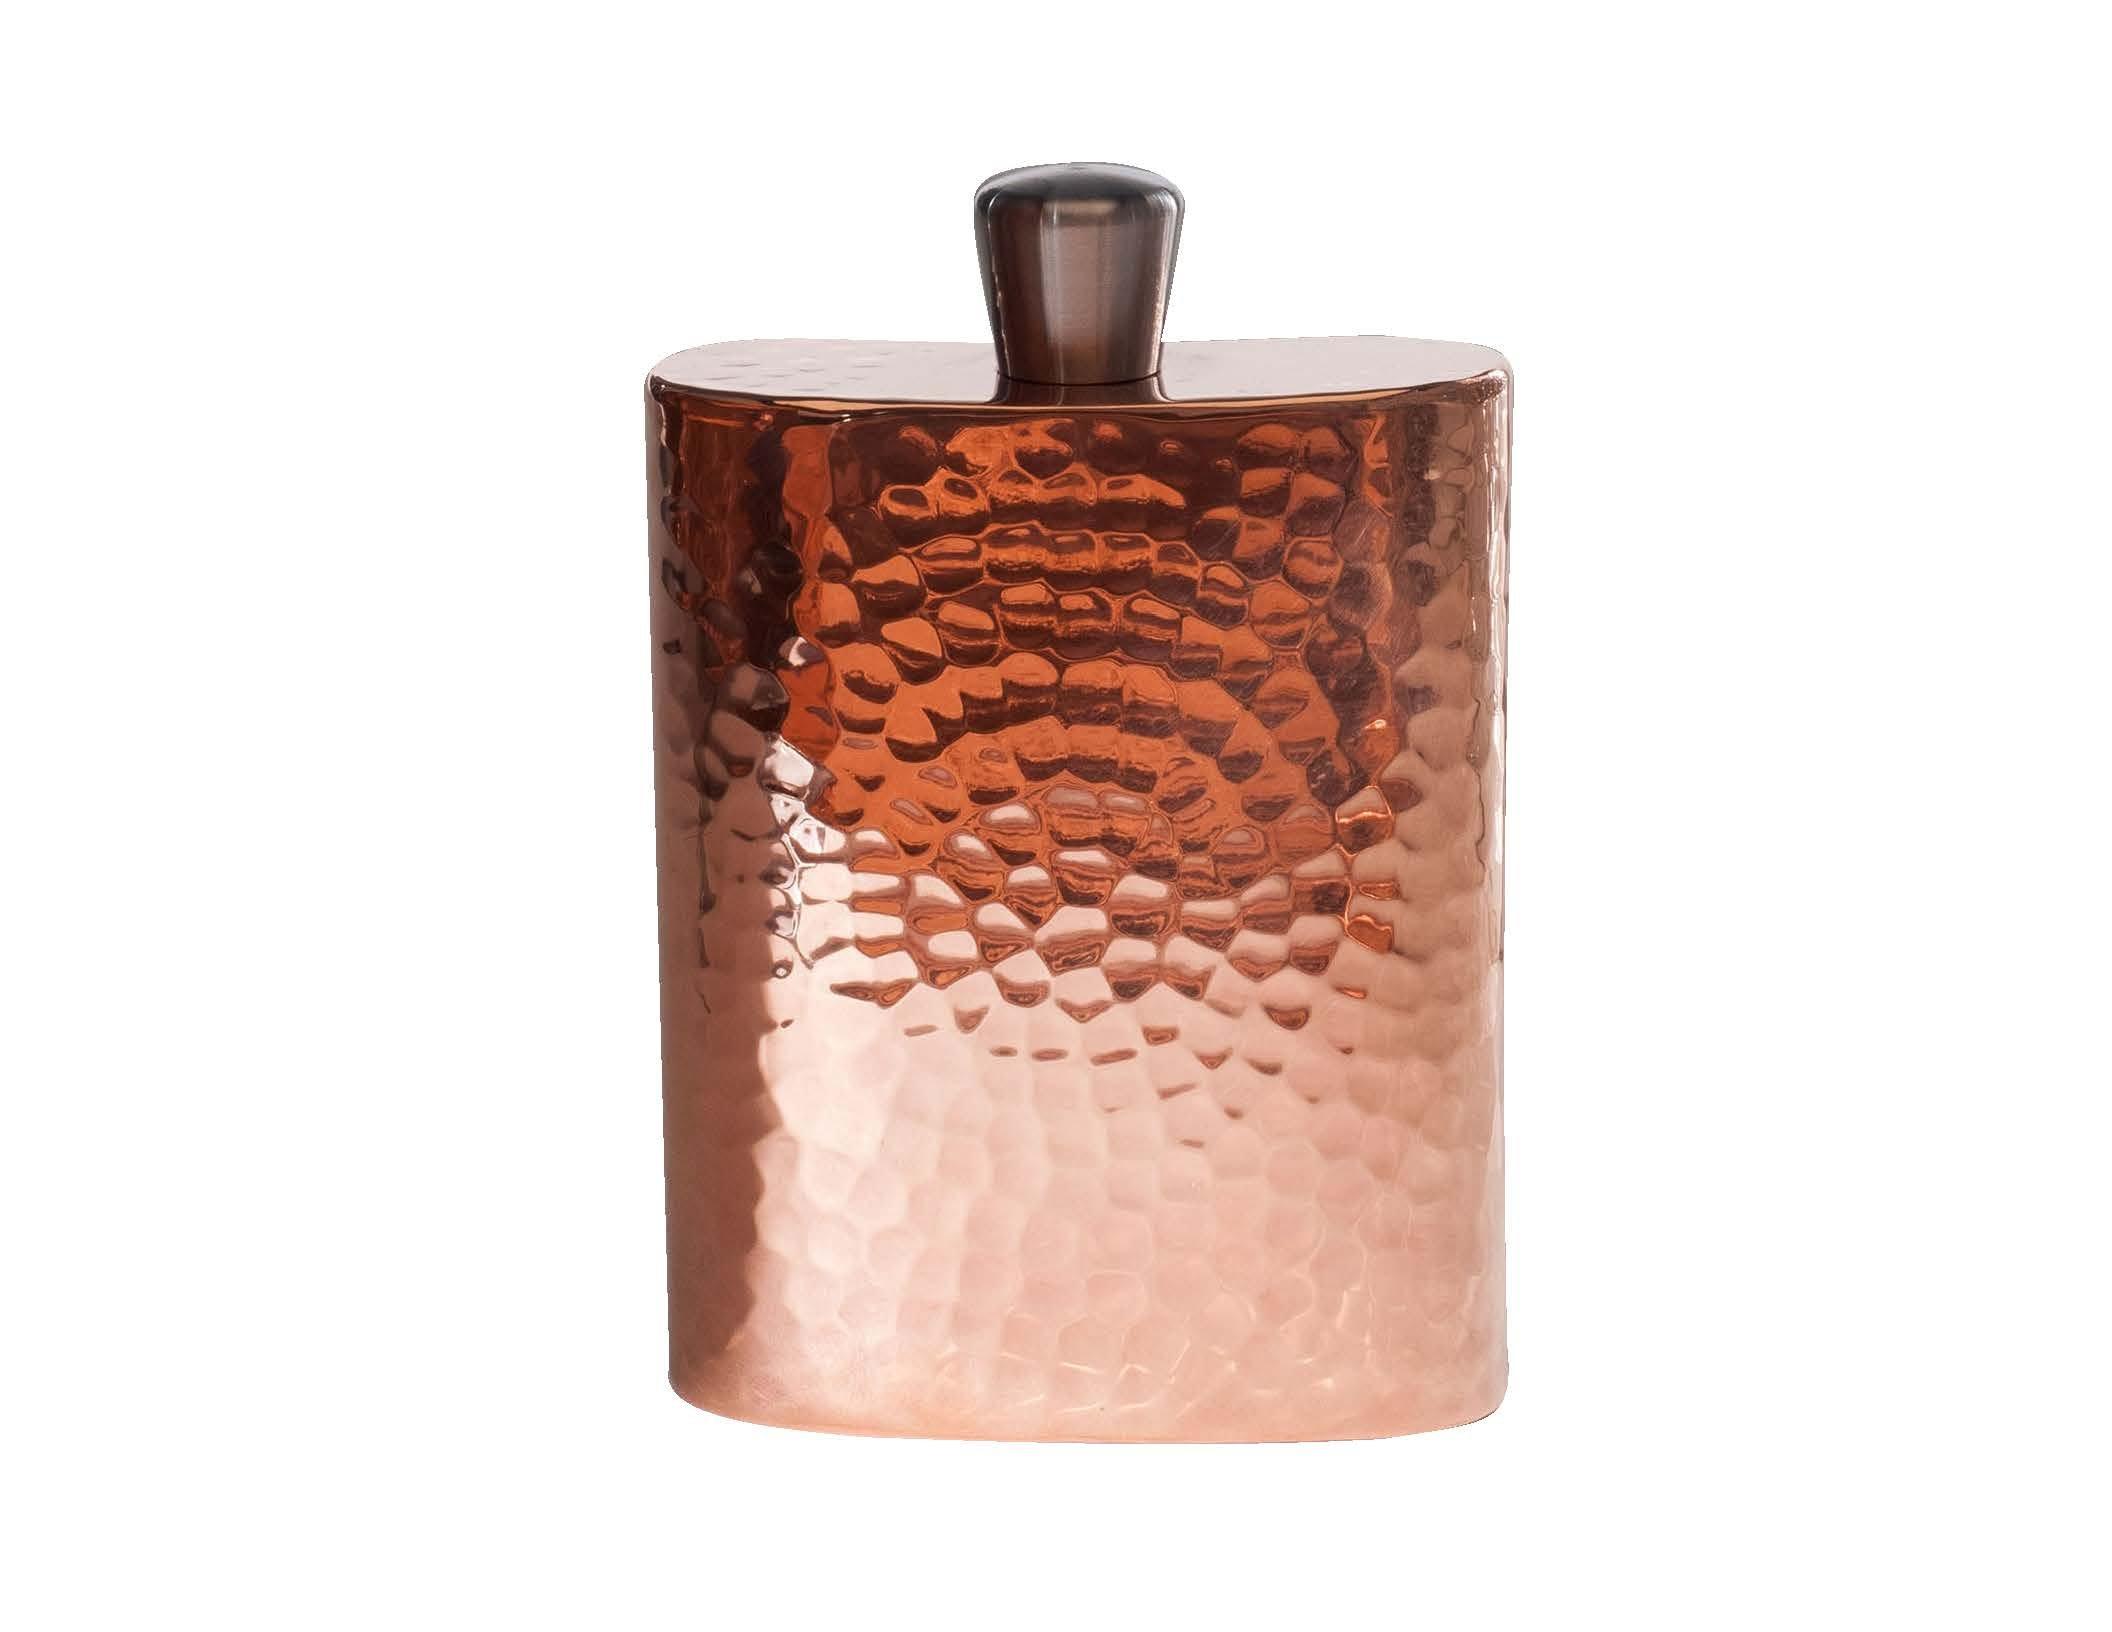 Sertodo Copper FLSK-ESP-4x5 Espadín Grand Daddy Flask with Funnel & Gift Box, Hand Hammered 100% Pure Copper, 12 oz